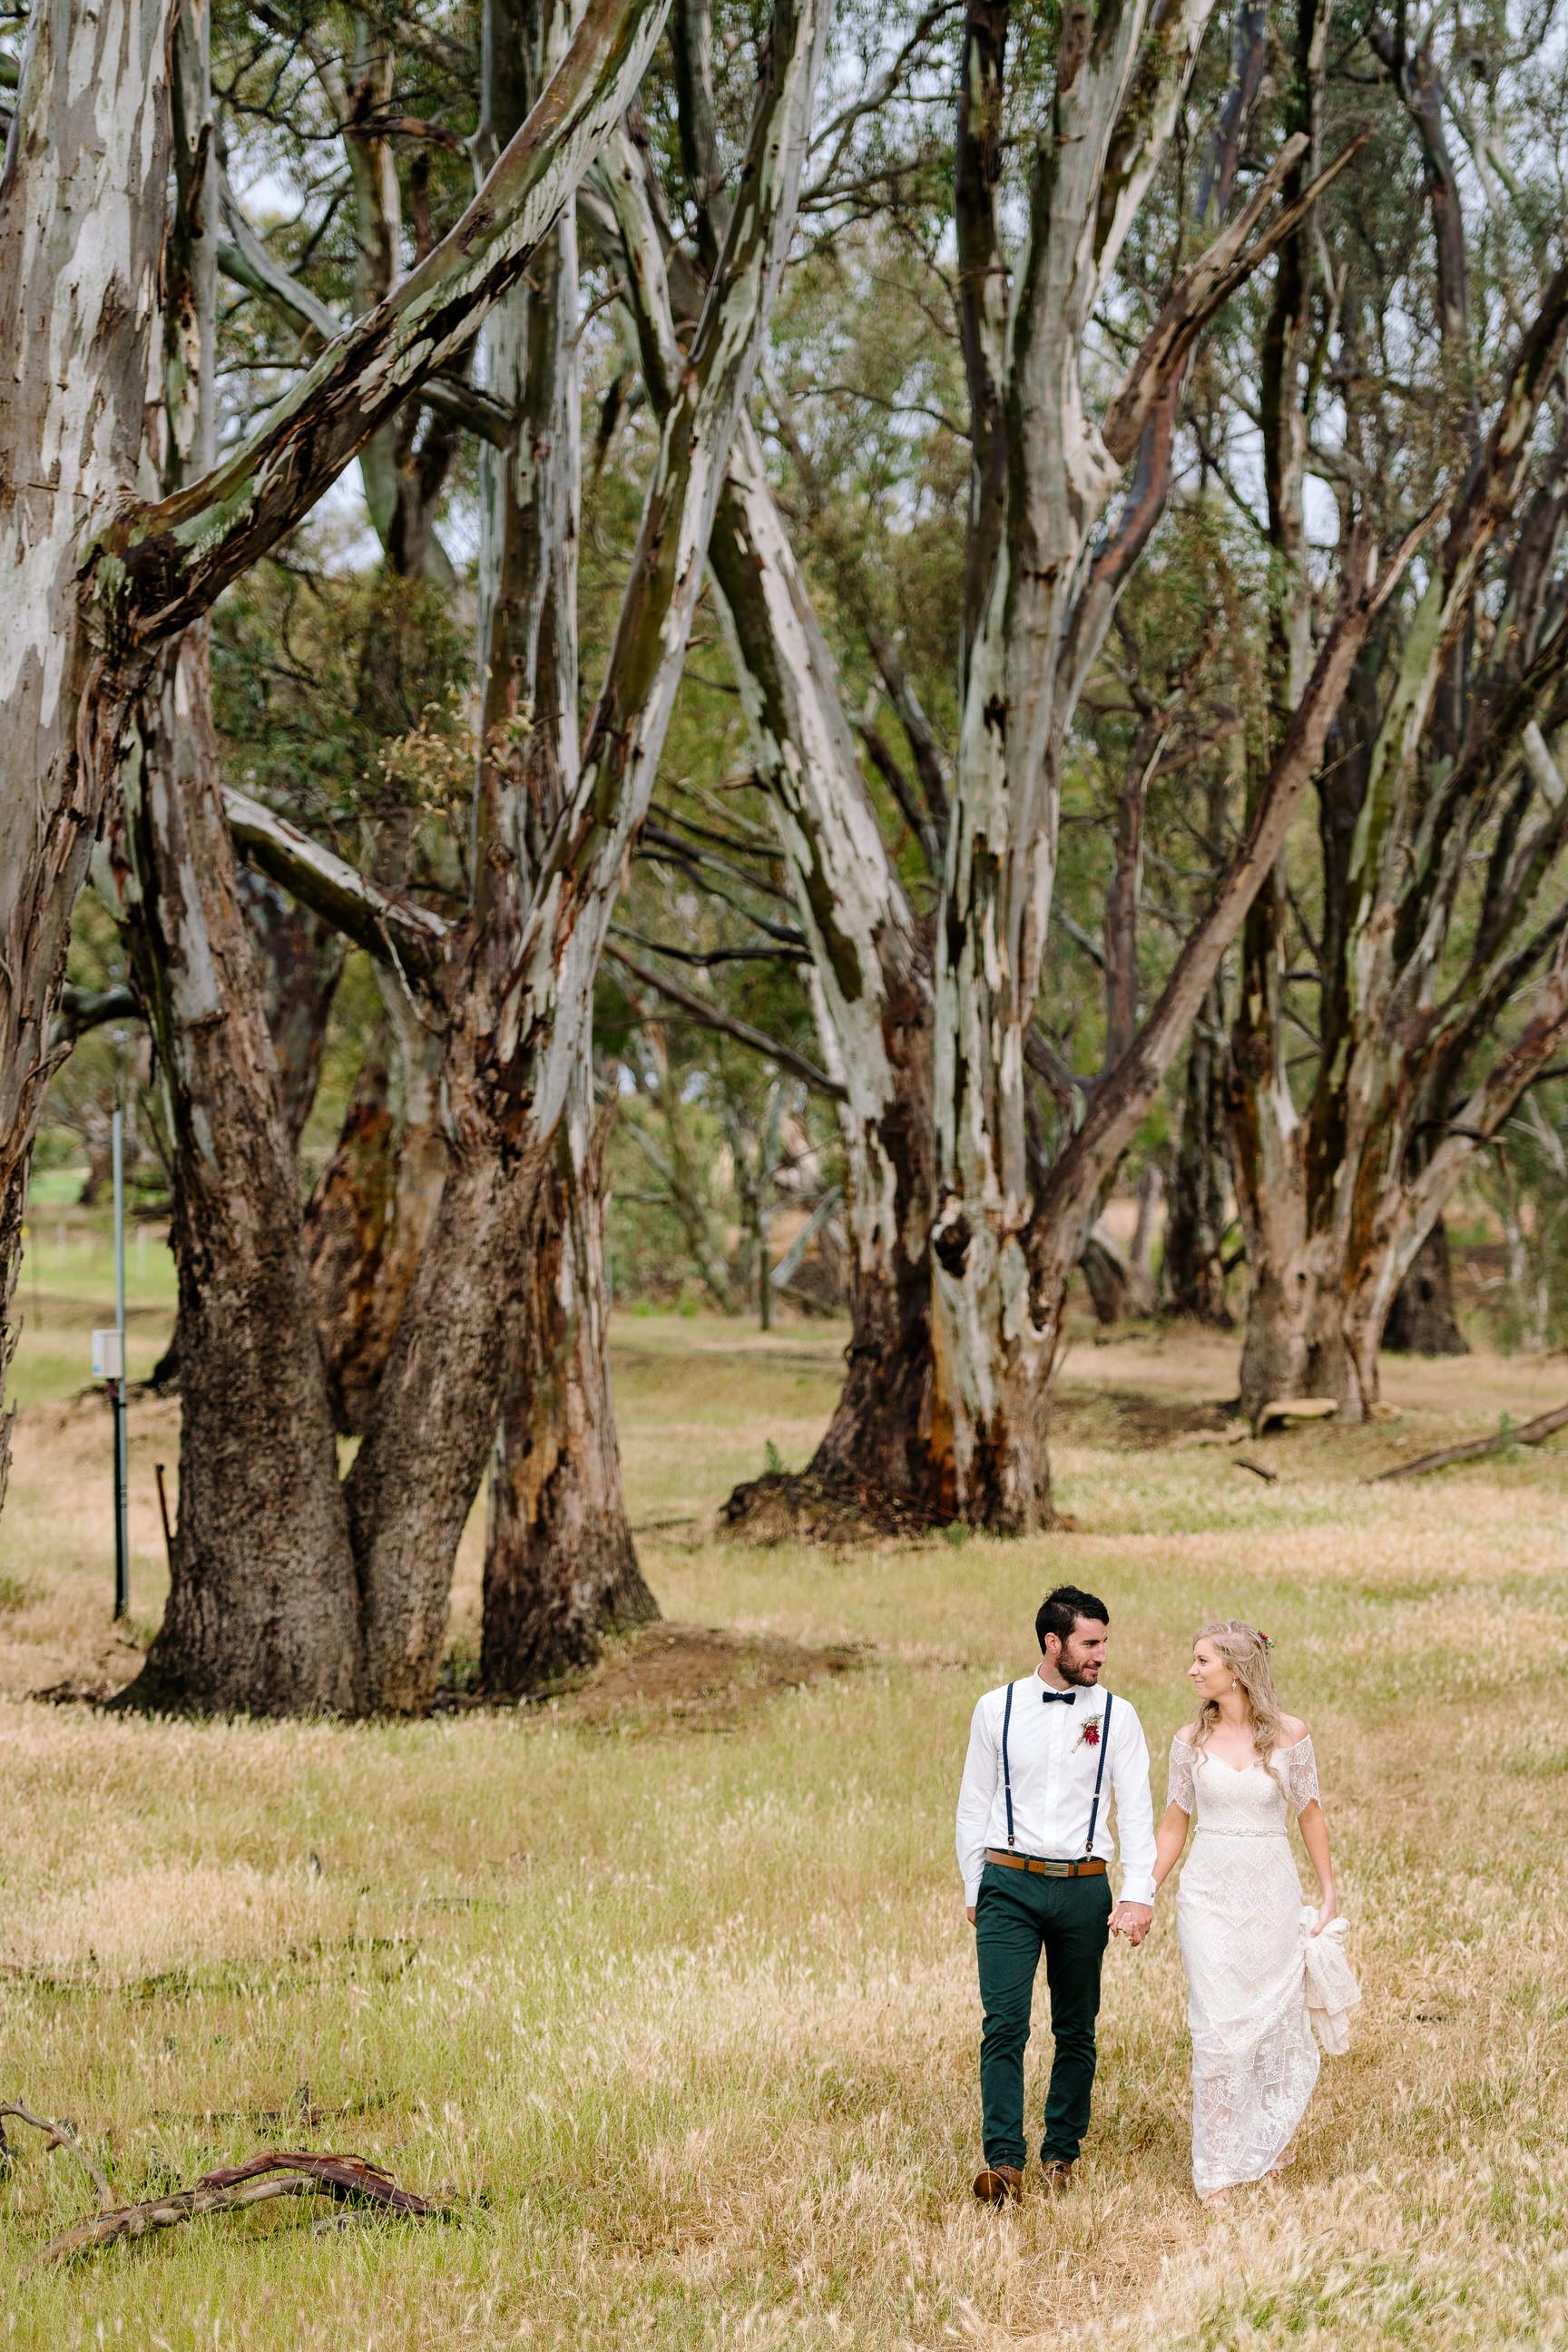 Justin_And_Jim_Photography_Backyard_Wedding203.JPG